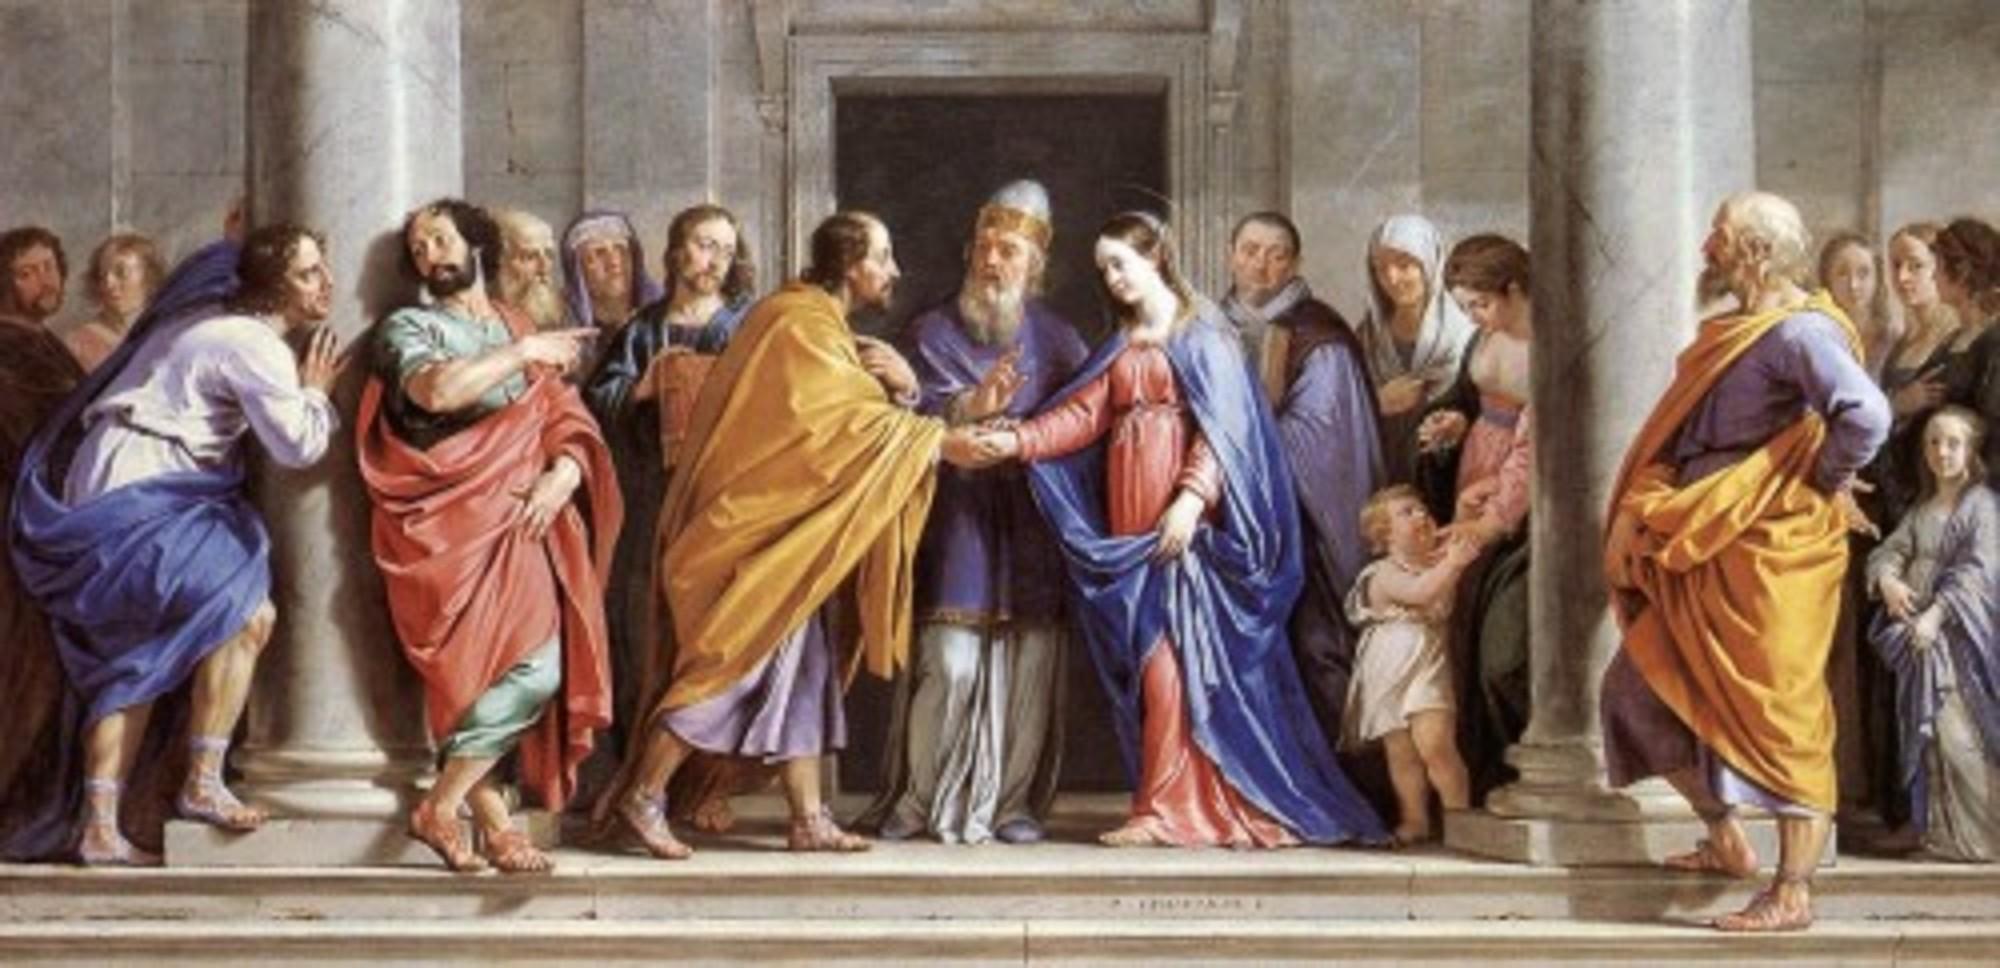 Philippe-de-Champaigne-The-Marriage-of-the-Virgin.jpg